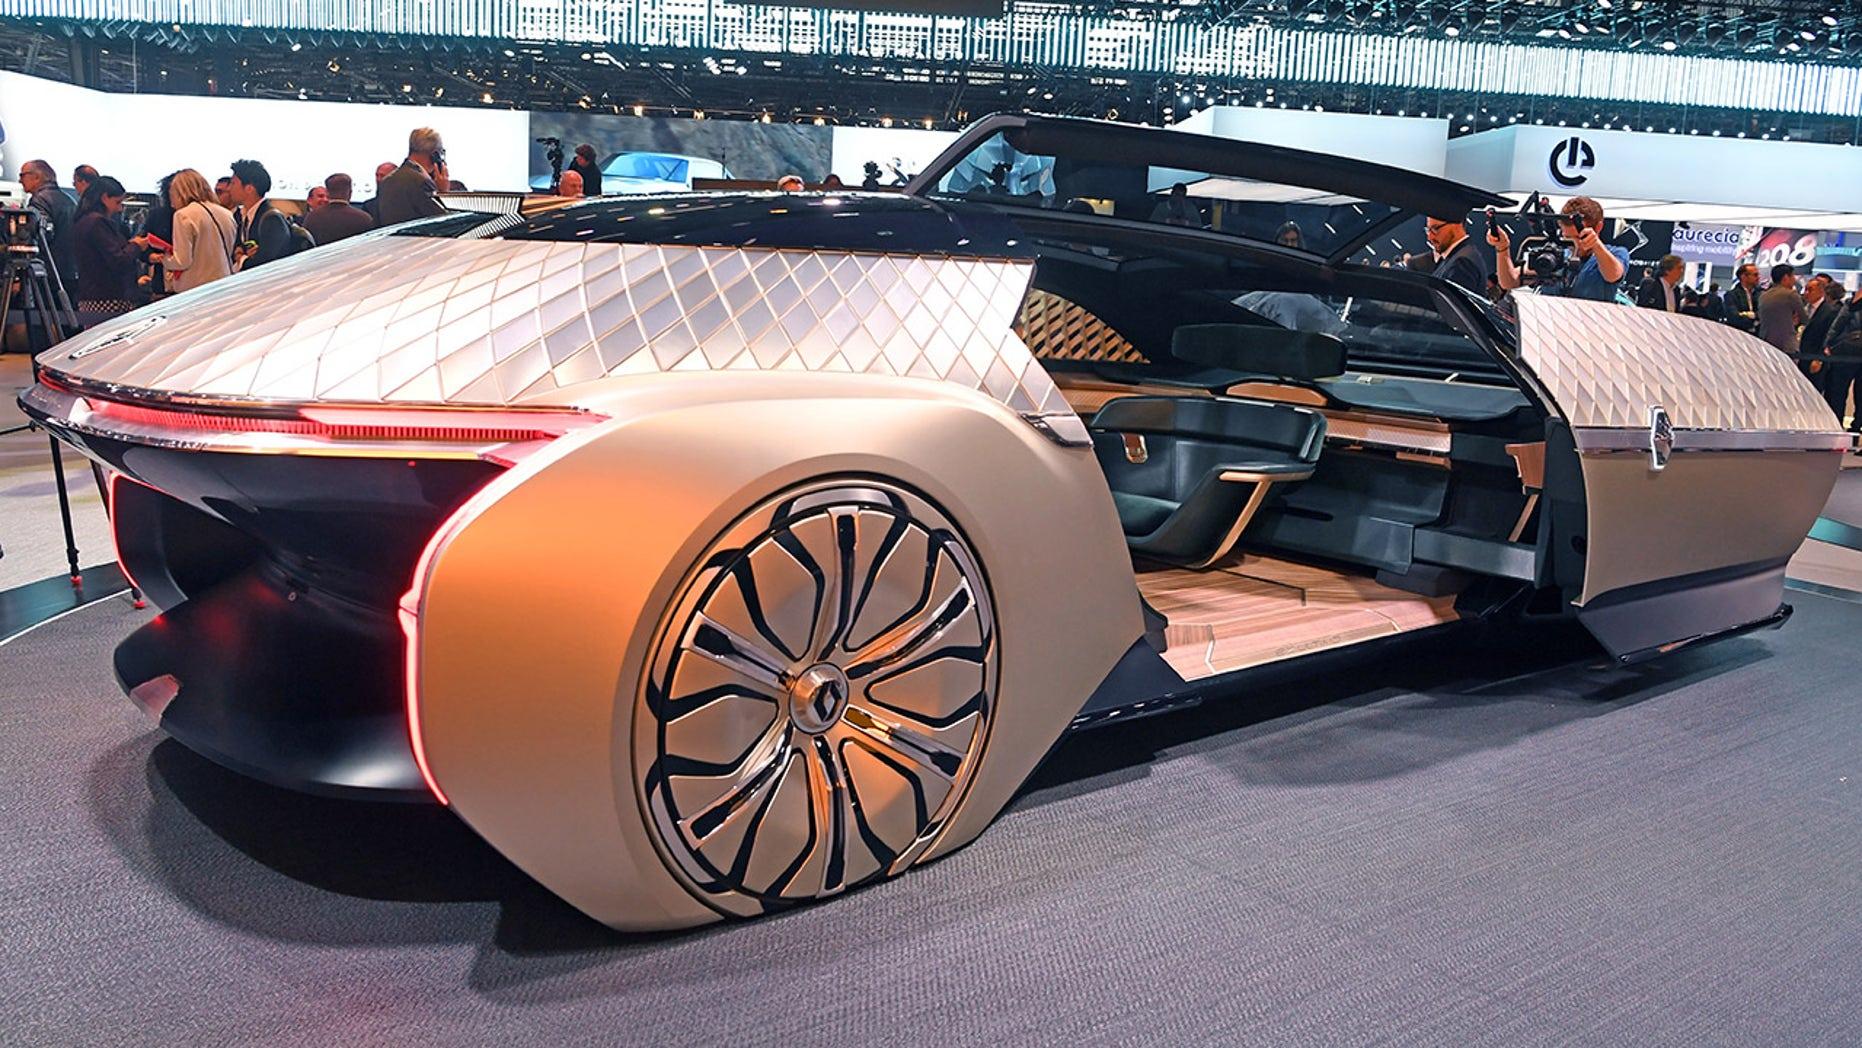 Uber Car Seat >> Renault EZ-Ultimo is an uber-stylish, self-driving car concept | Fox News